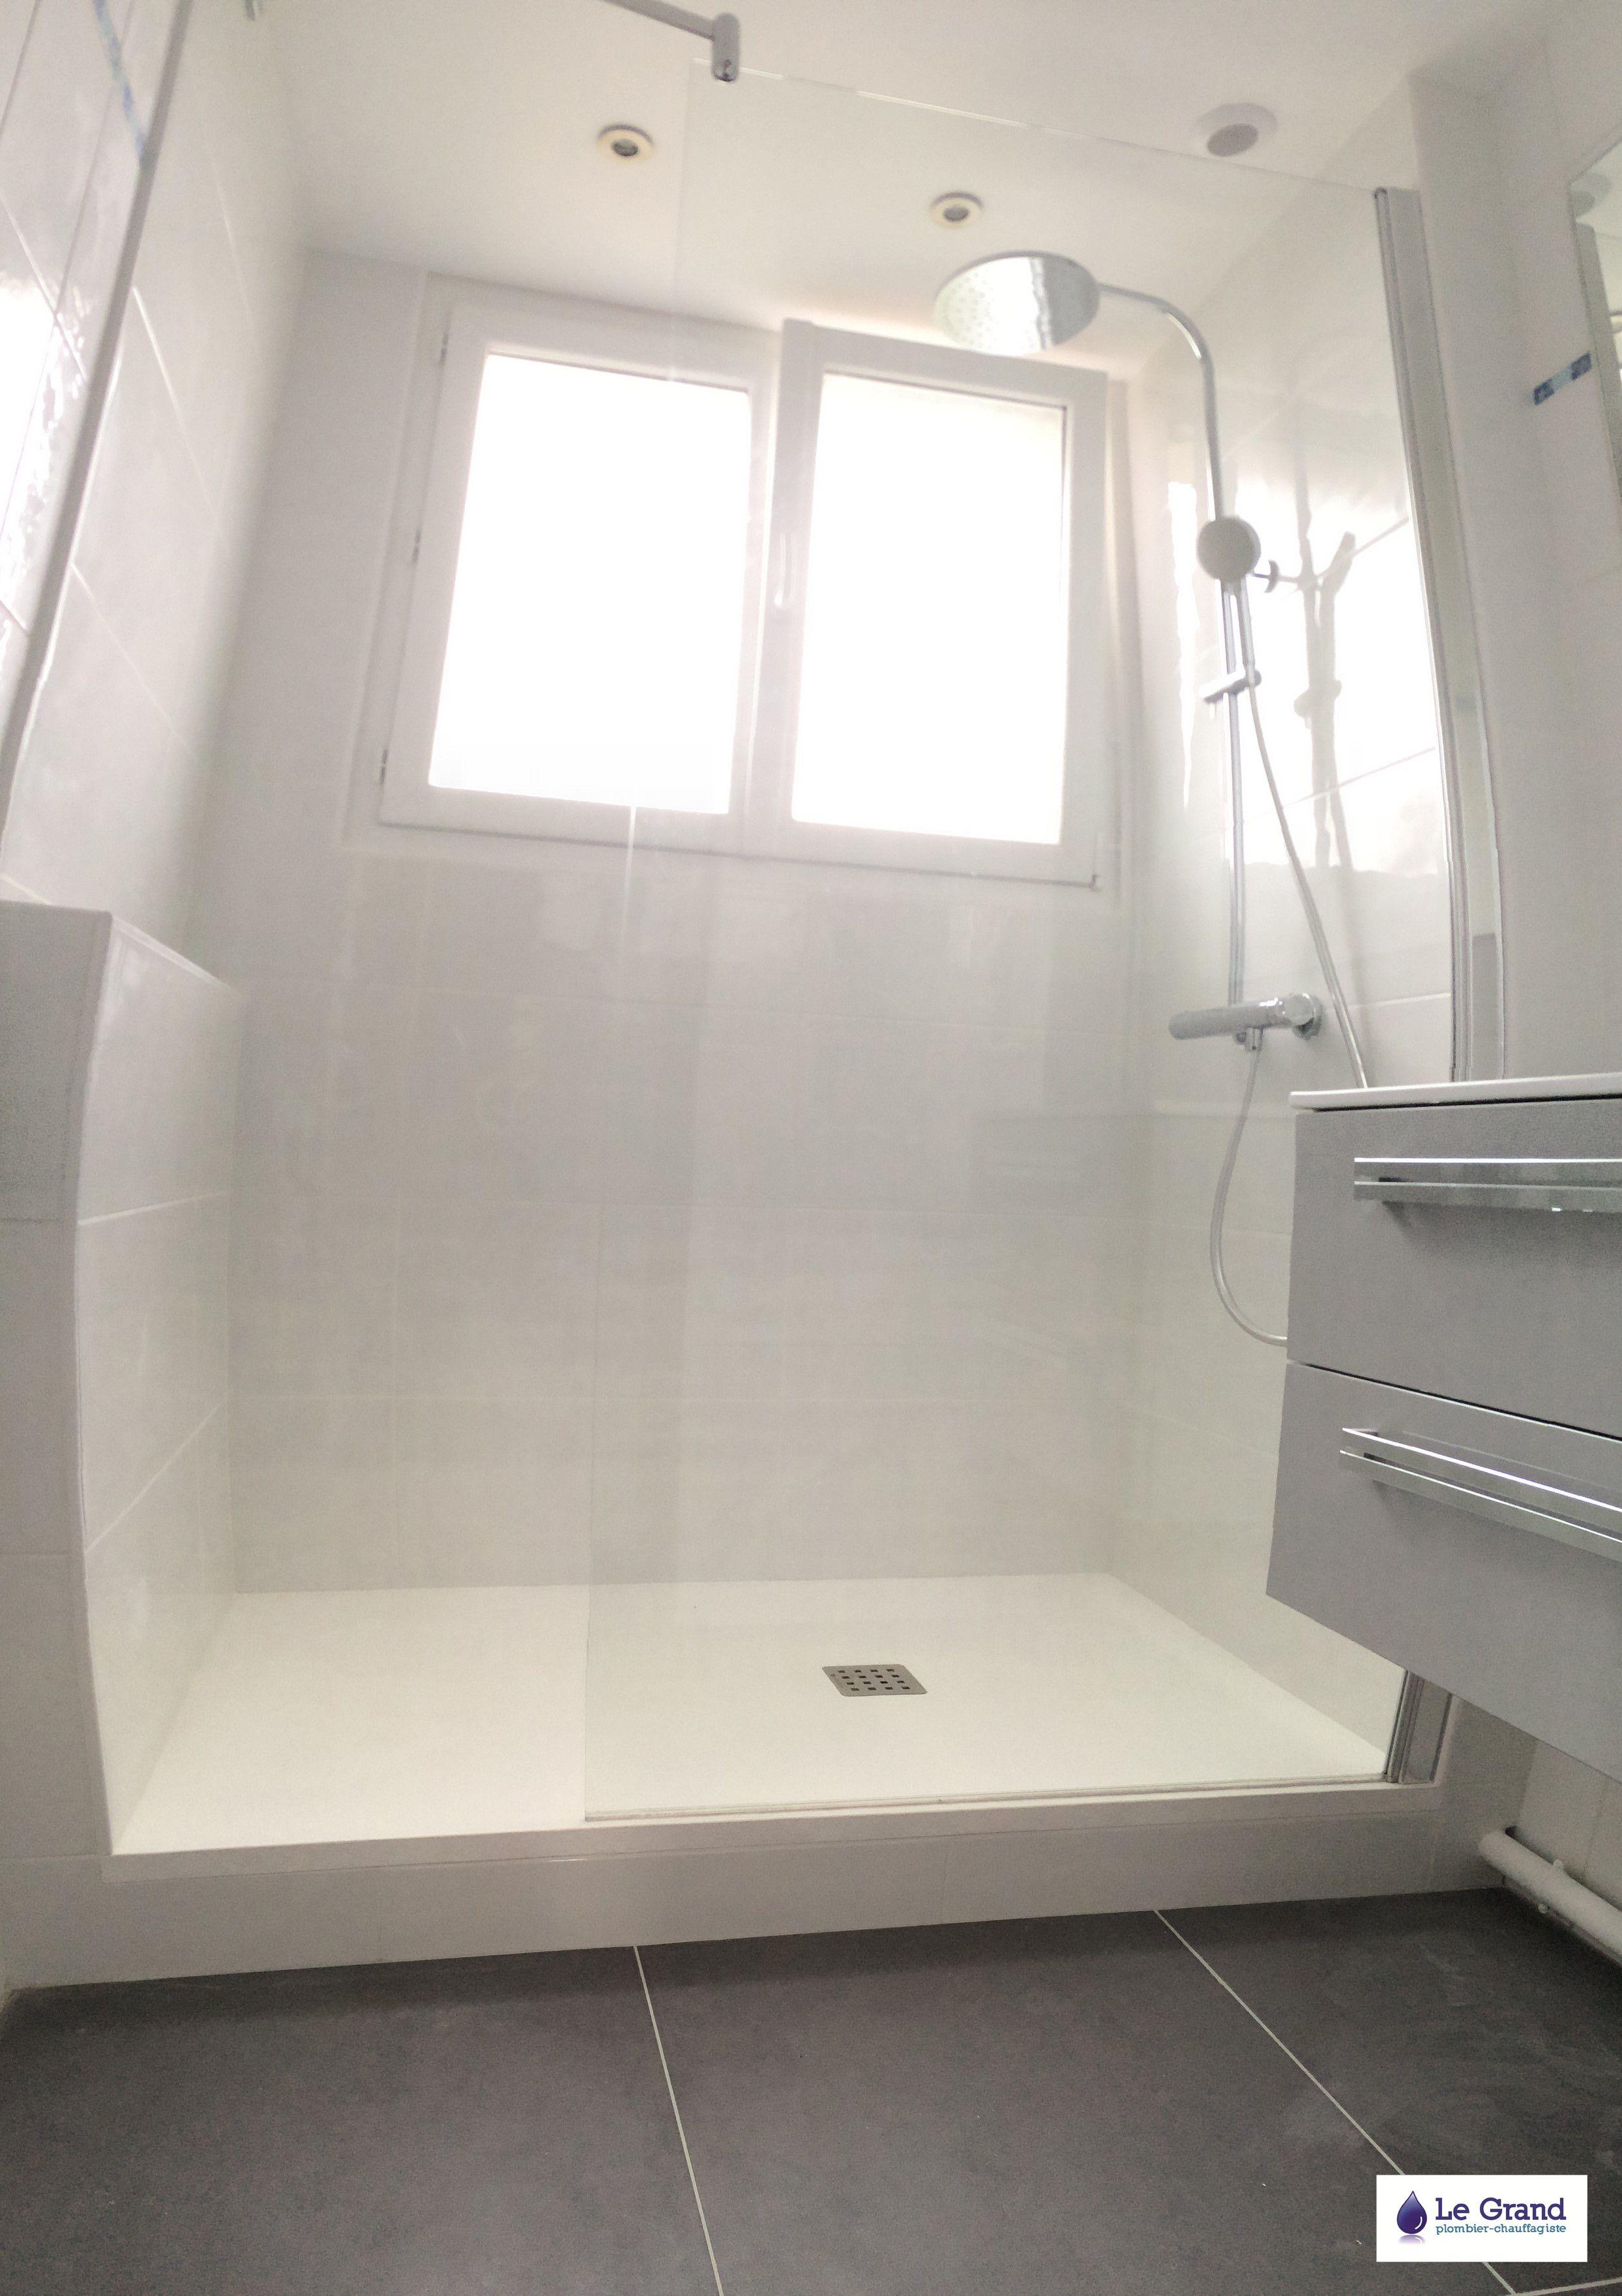 httpslegrandthomasplombierfileswordpresscom201303salle de bains rennes le grand plombier chauffagiste receveur aquabella blancjpg pinterest - Aquabella Salle De Bain